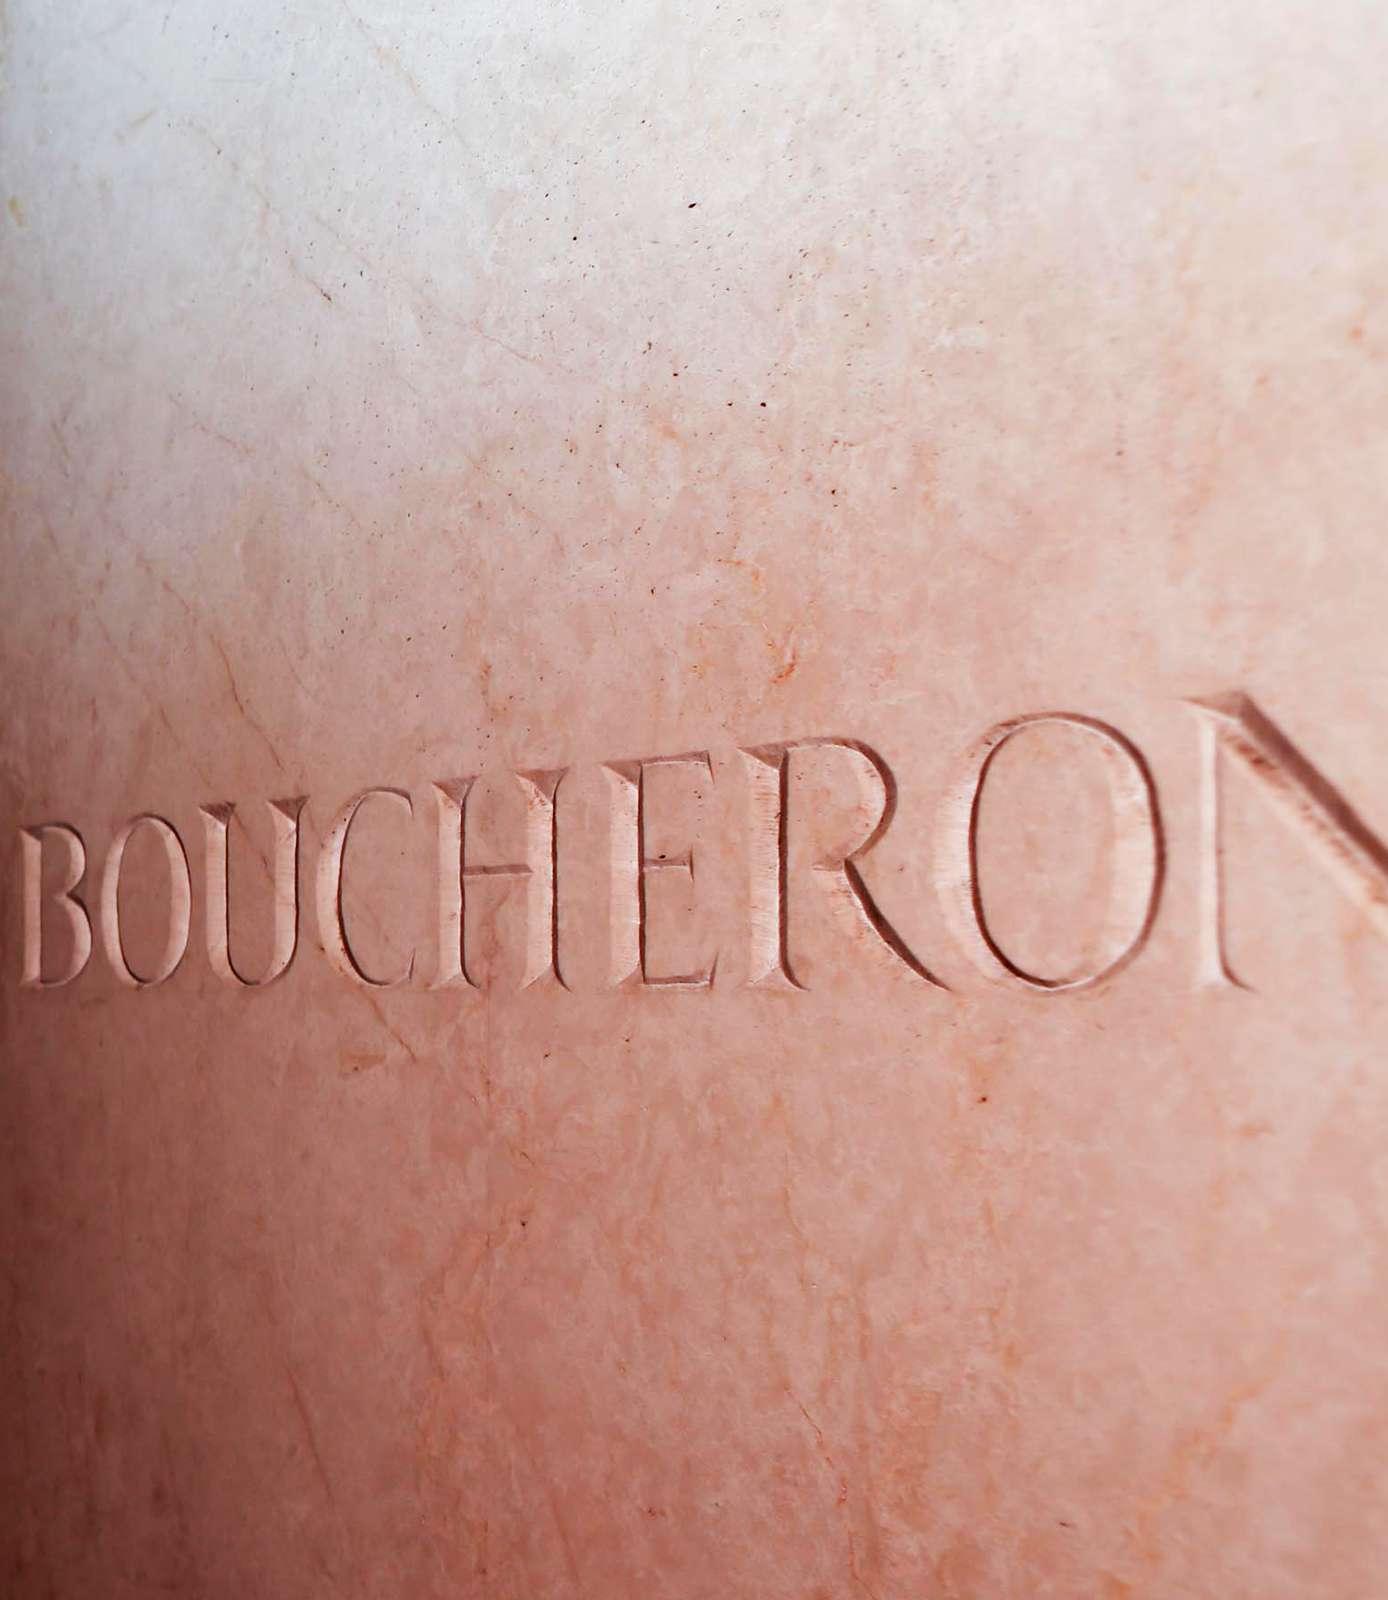 boucheron_ww13_01_2